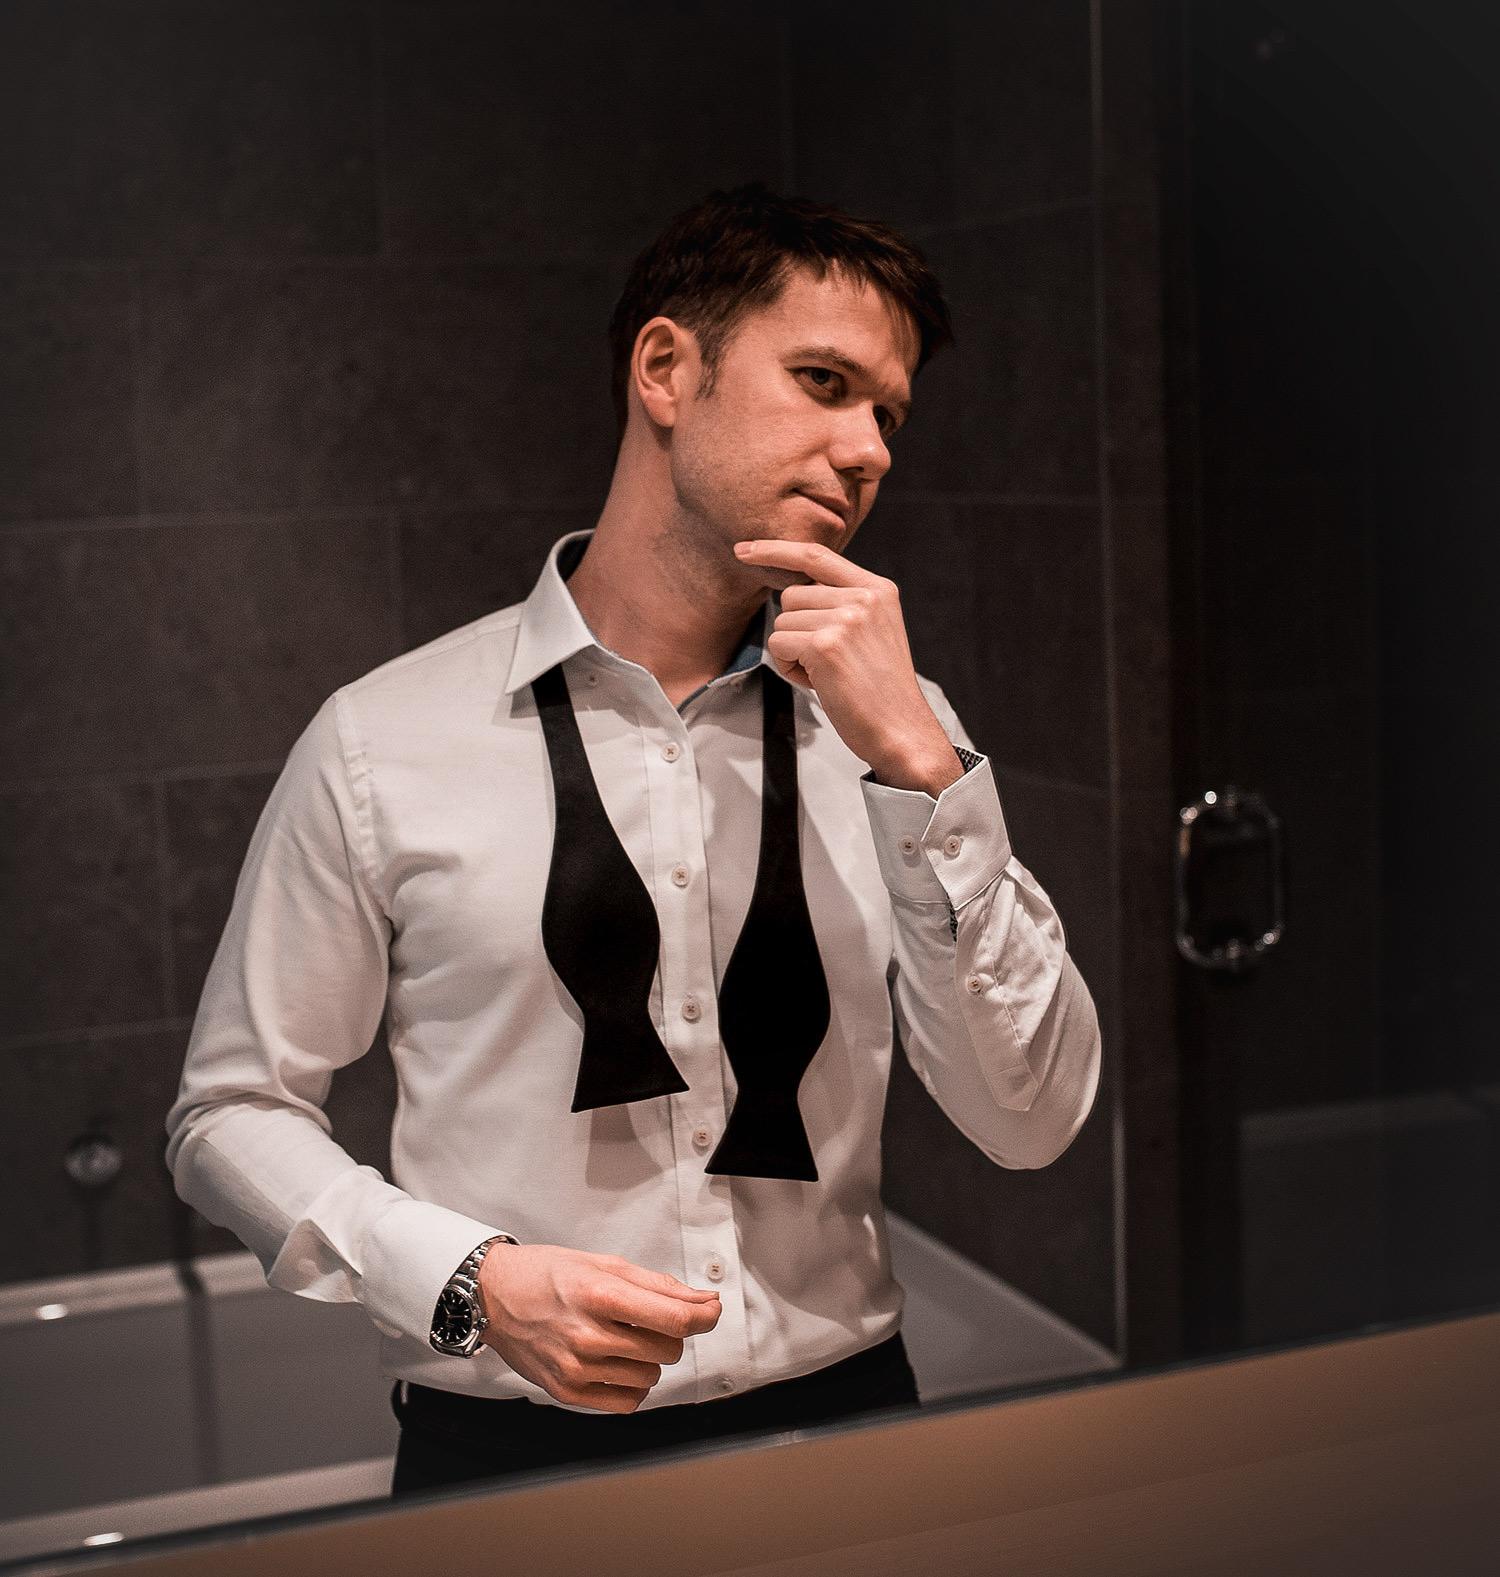 Gillette SkinGuard Sensitive Razor Review | Your Average Guy